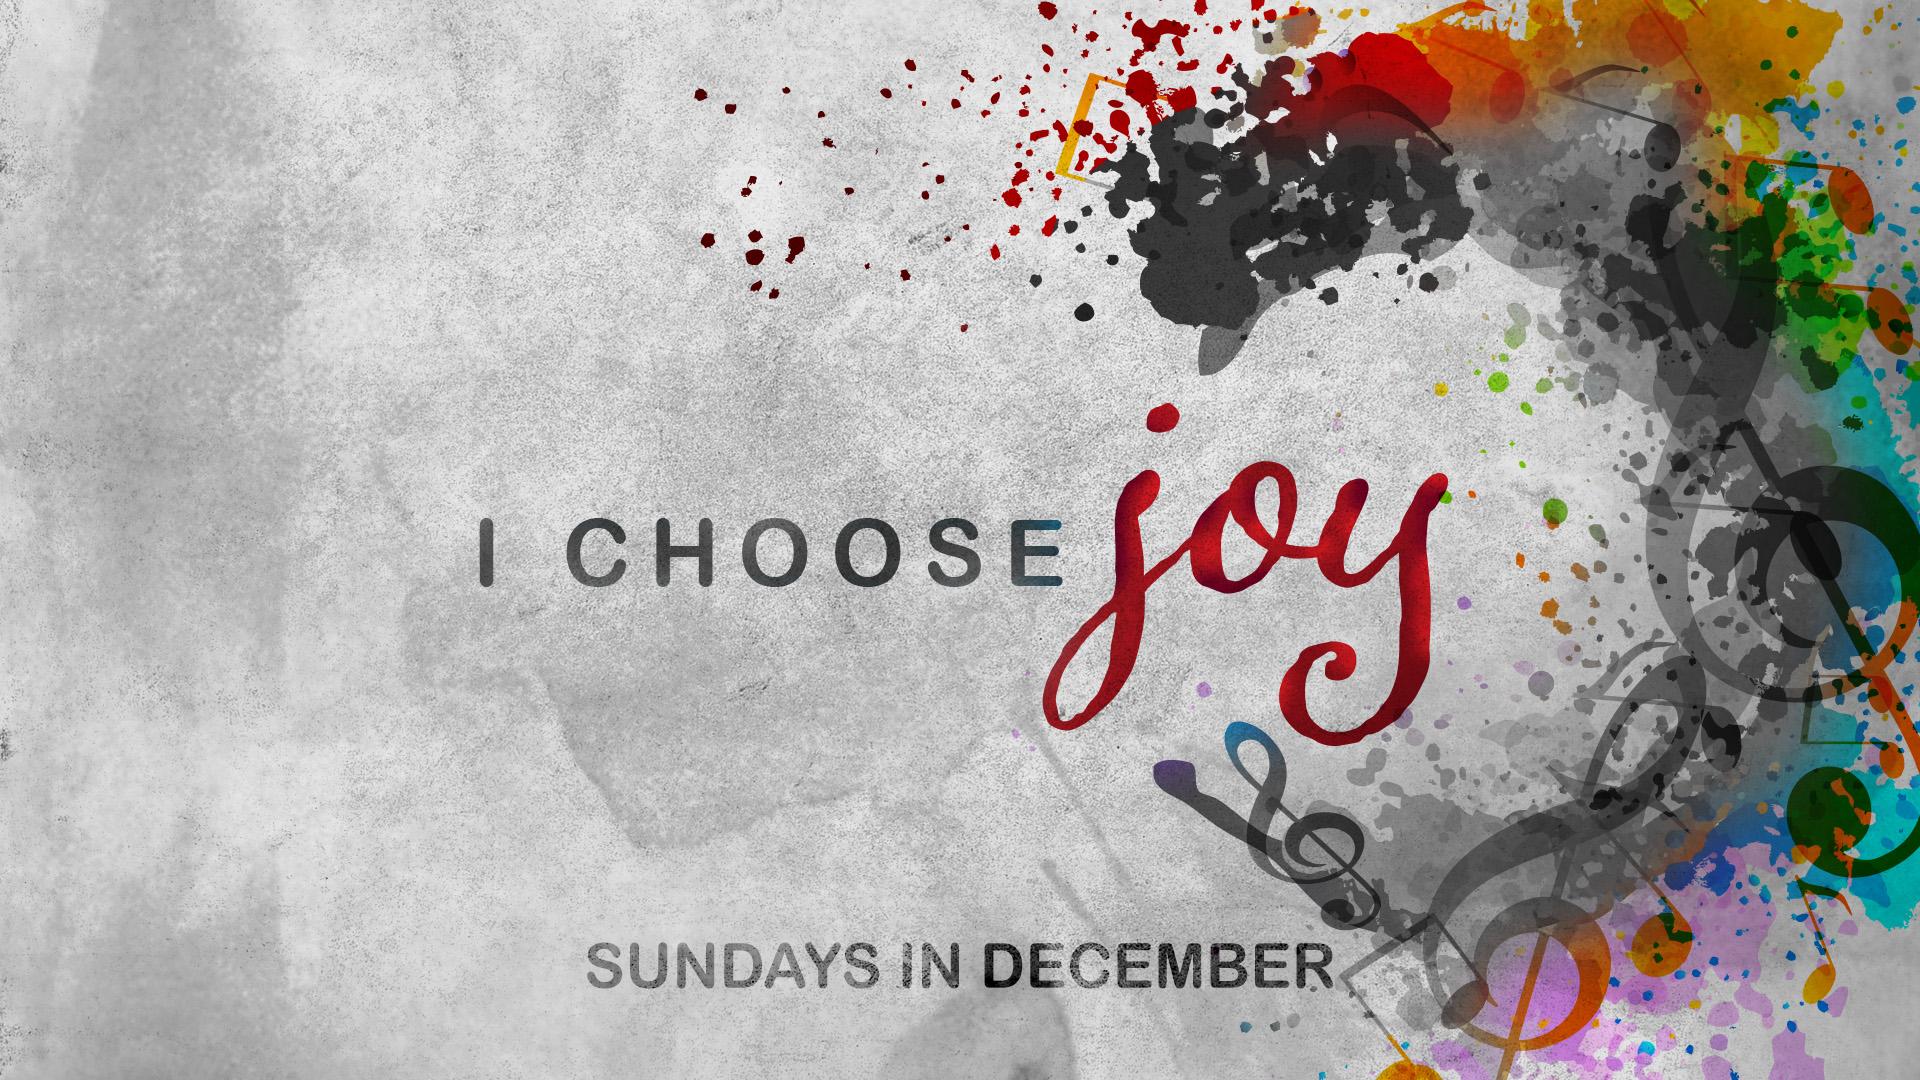 Christmas Eve 2020 : Joy To The World, December 24 I Choose Joy | Christmas Message Series |   Broad River Church